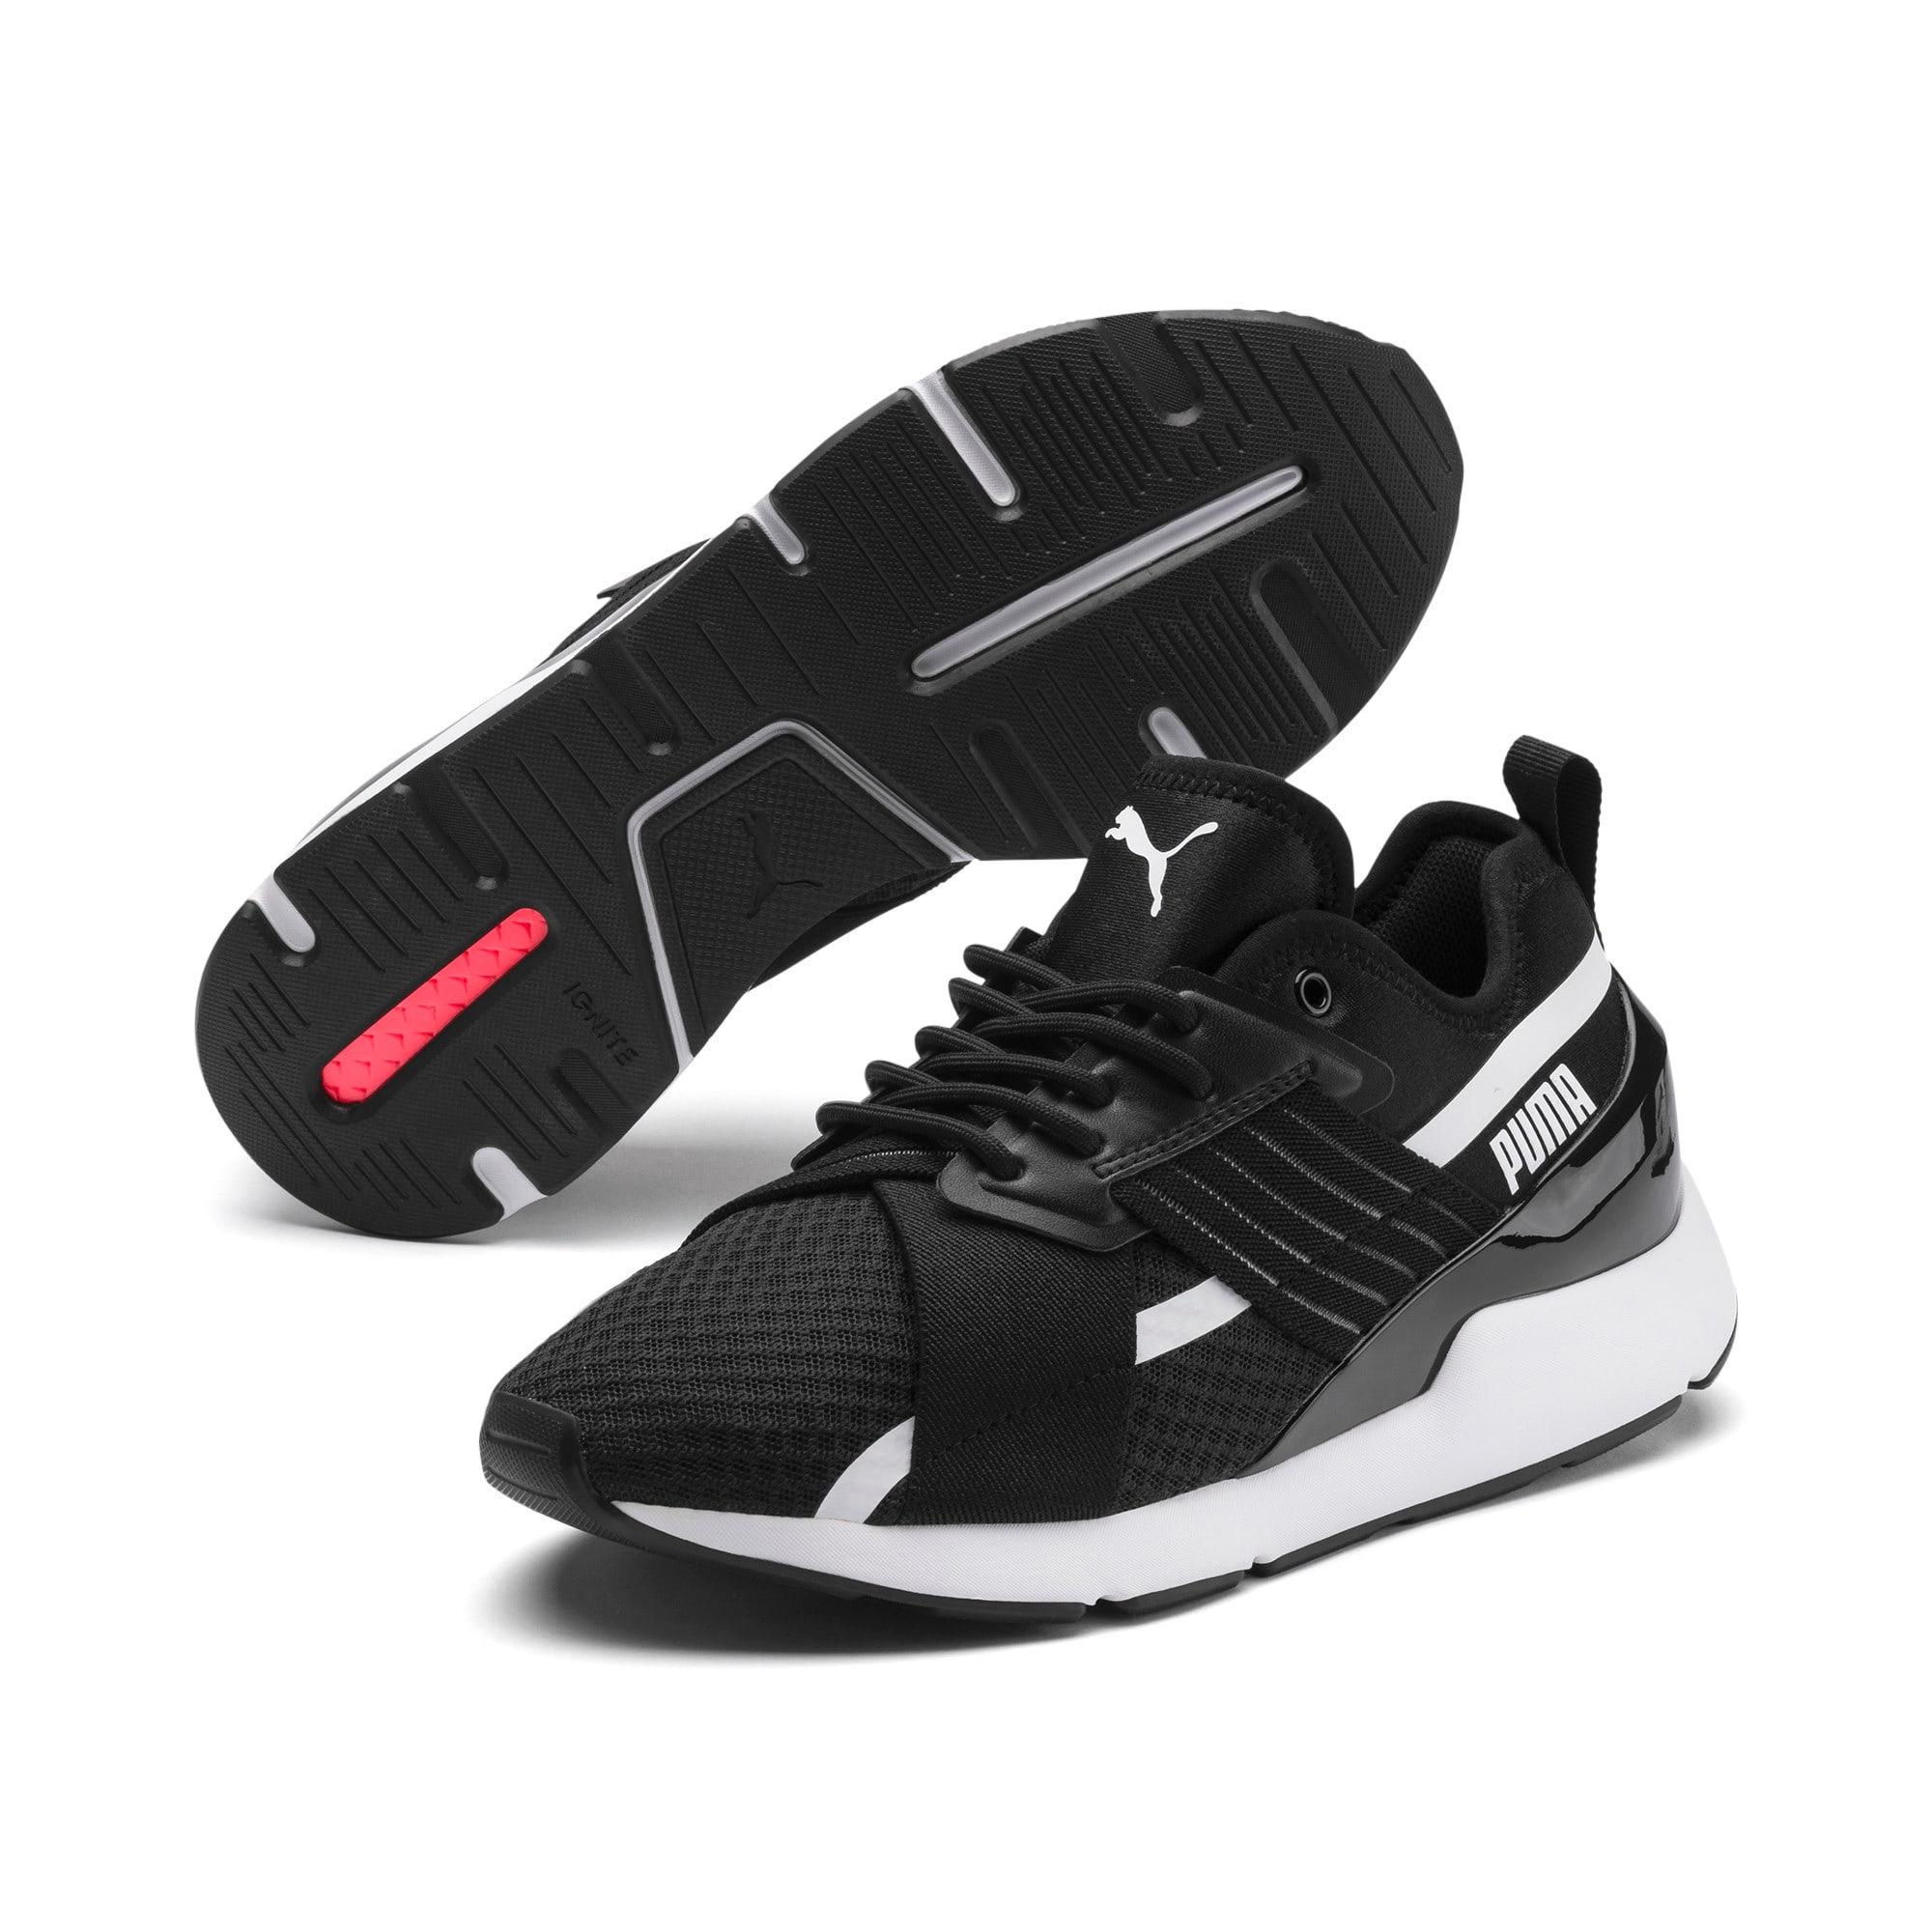 Thumbnail 2 of Muse X-2 Women's Sneakers, Puma Black-Puma White, medium